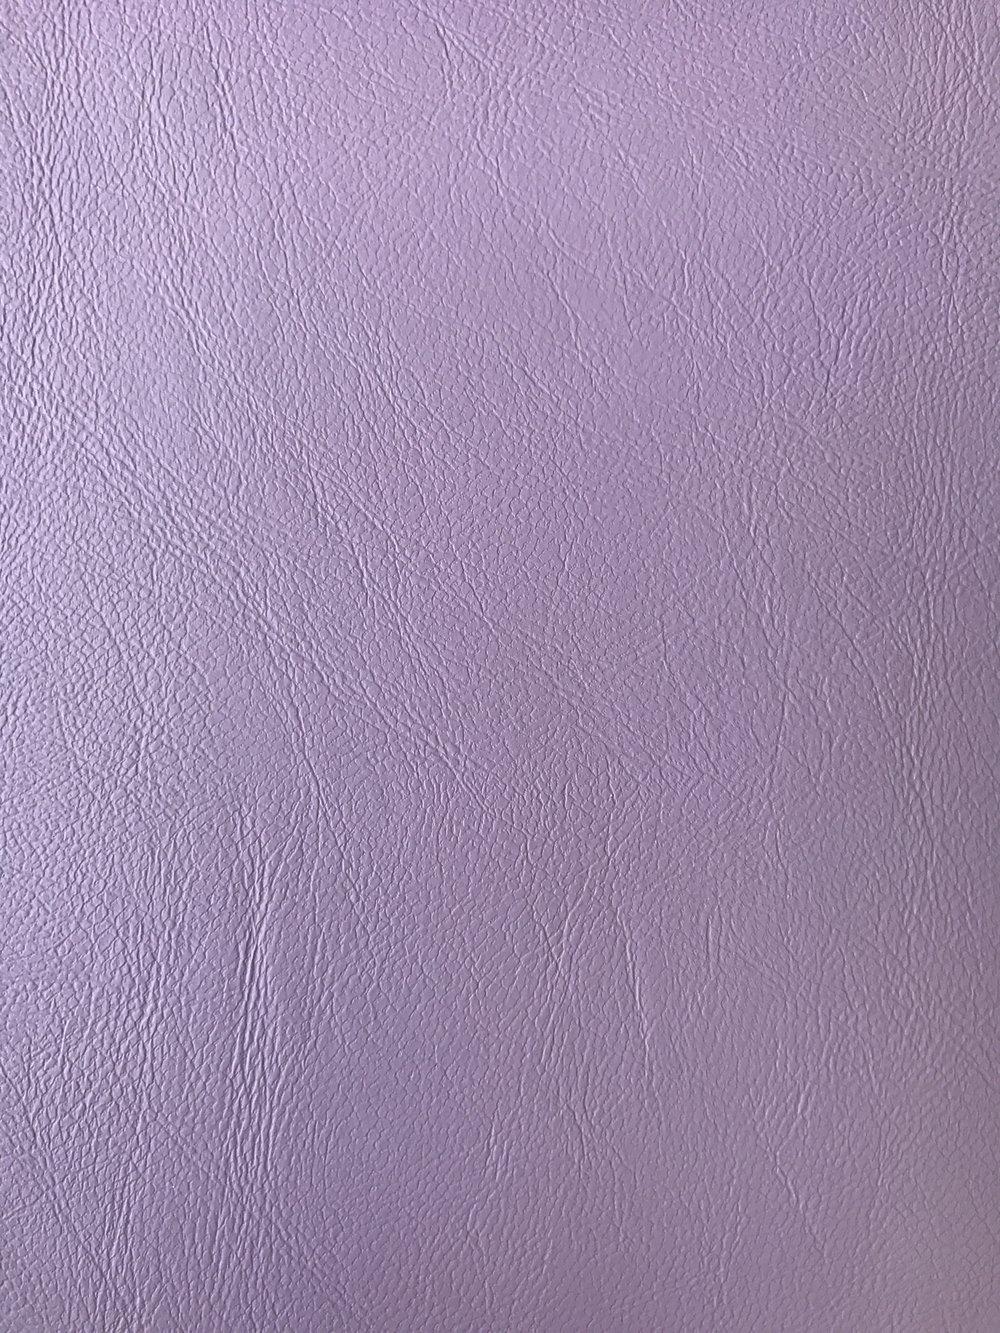 B13 Lilac